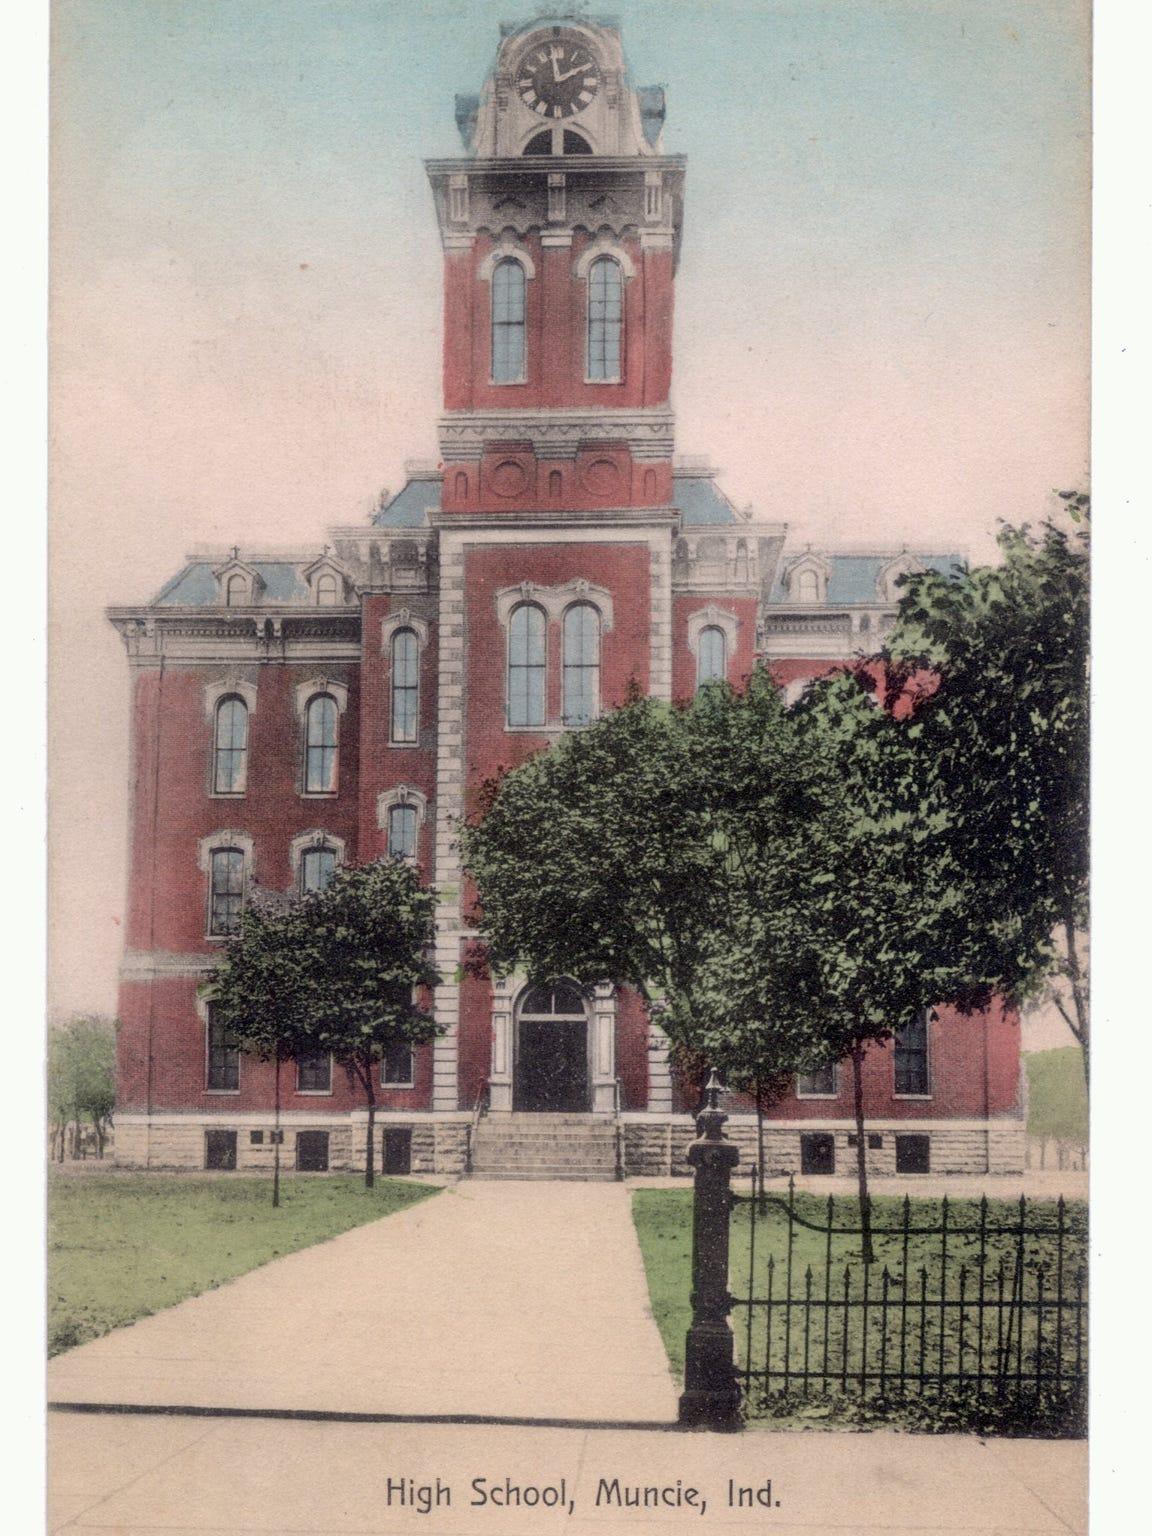 #13 Muncie High School - pre Central - Circa 1910 from postcard.jpg